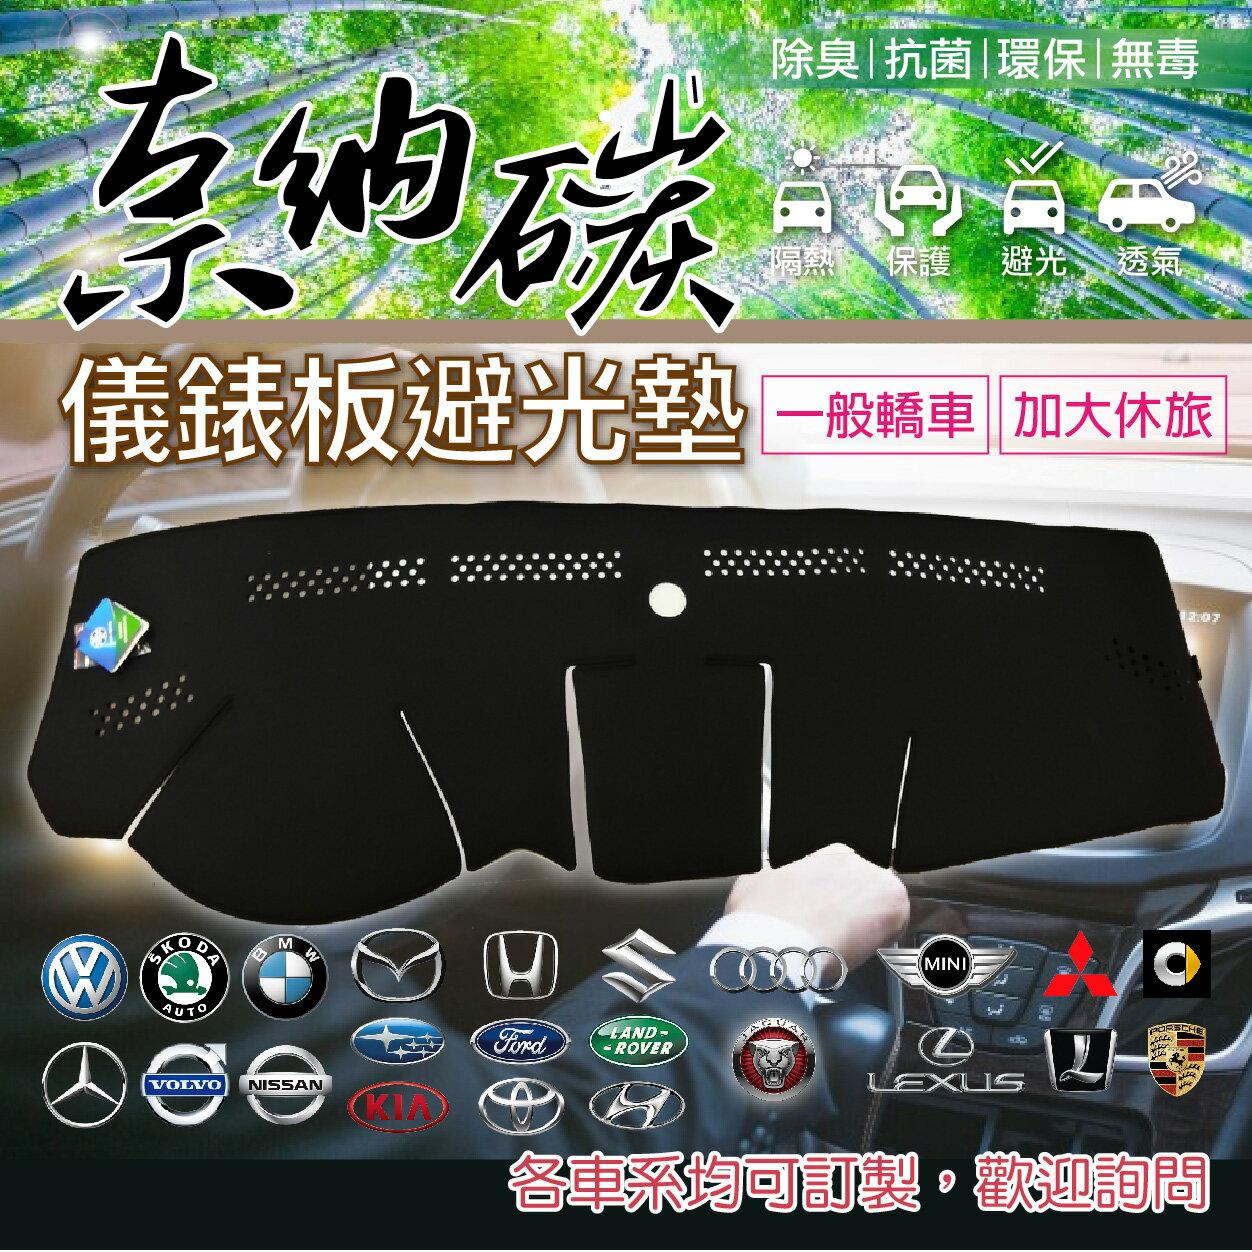 e系列【奈納碳避光墊】抗菌 黑色避光墊 前檔 台灣製 竹碳纖維 儀錶板